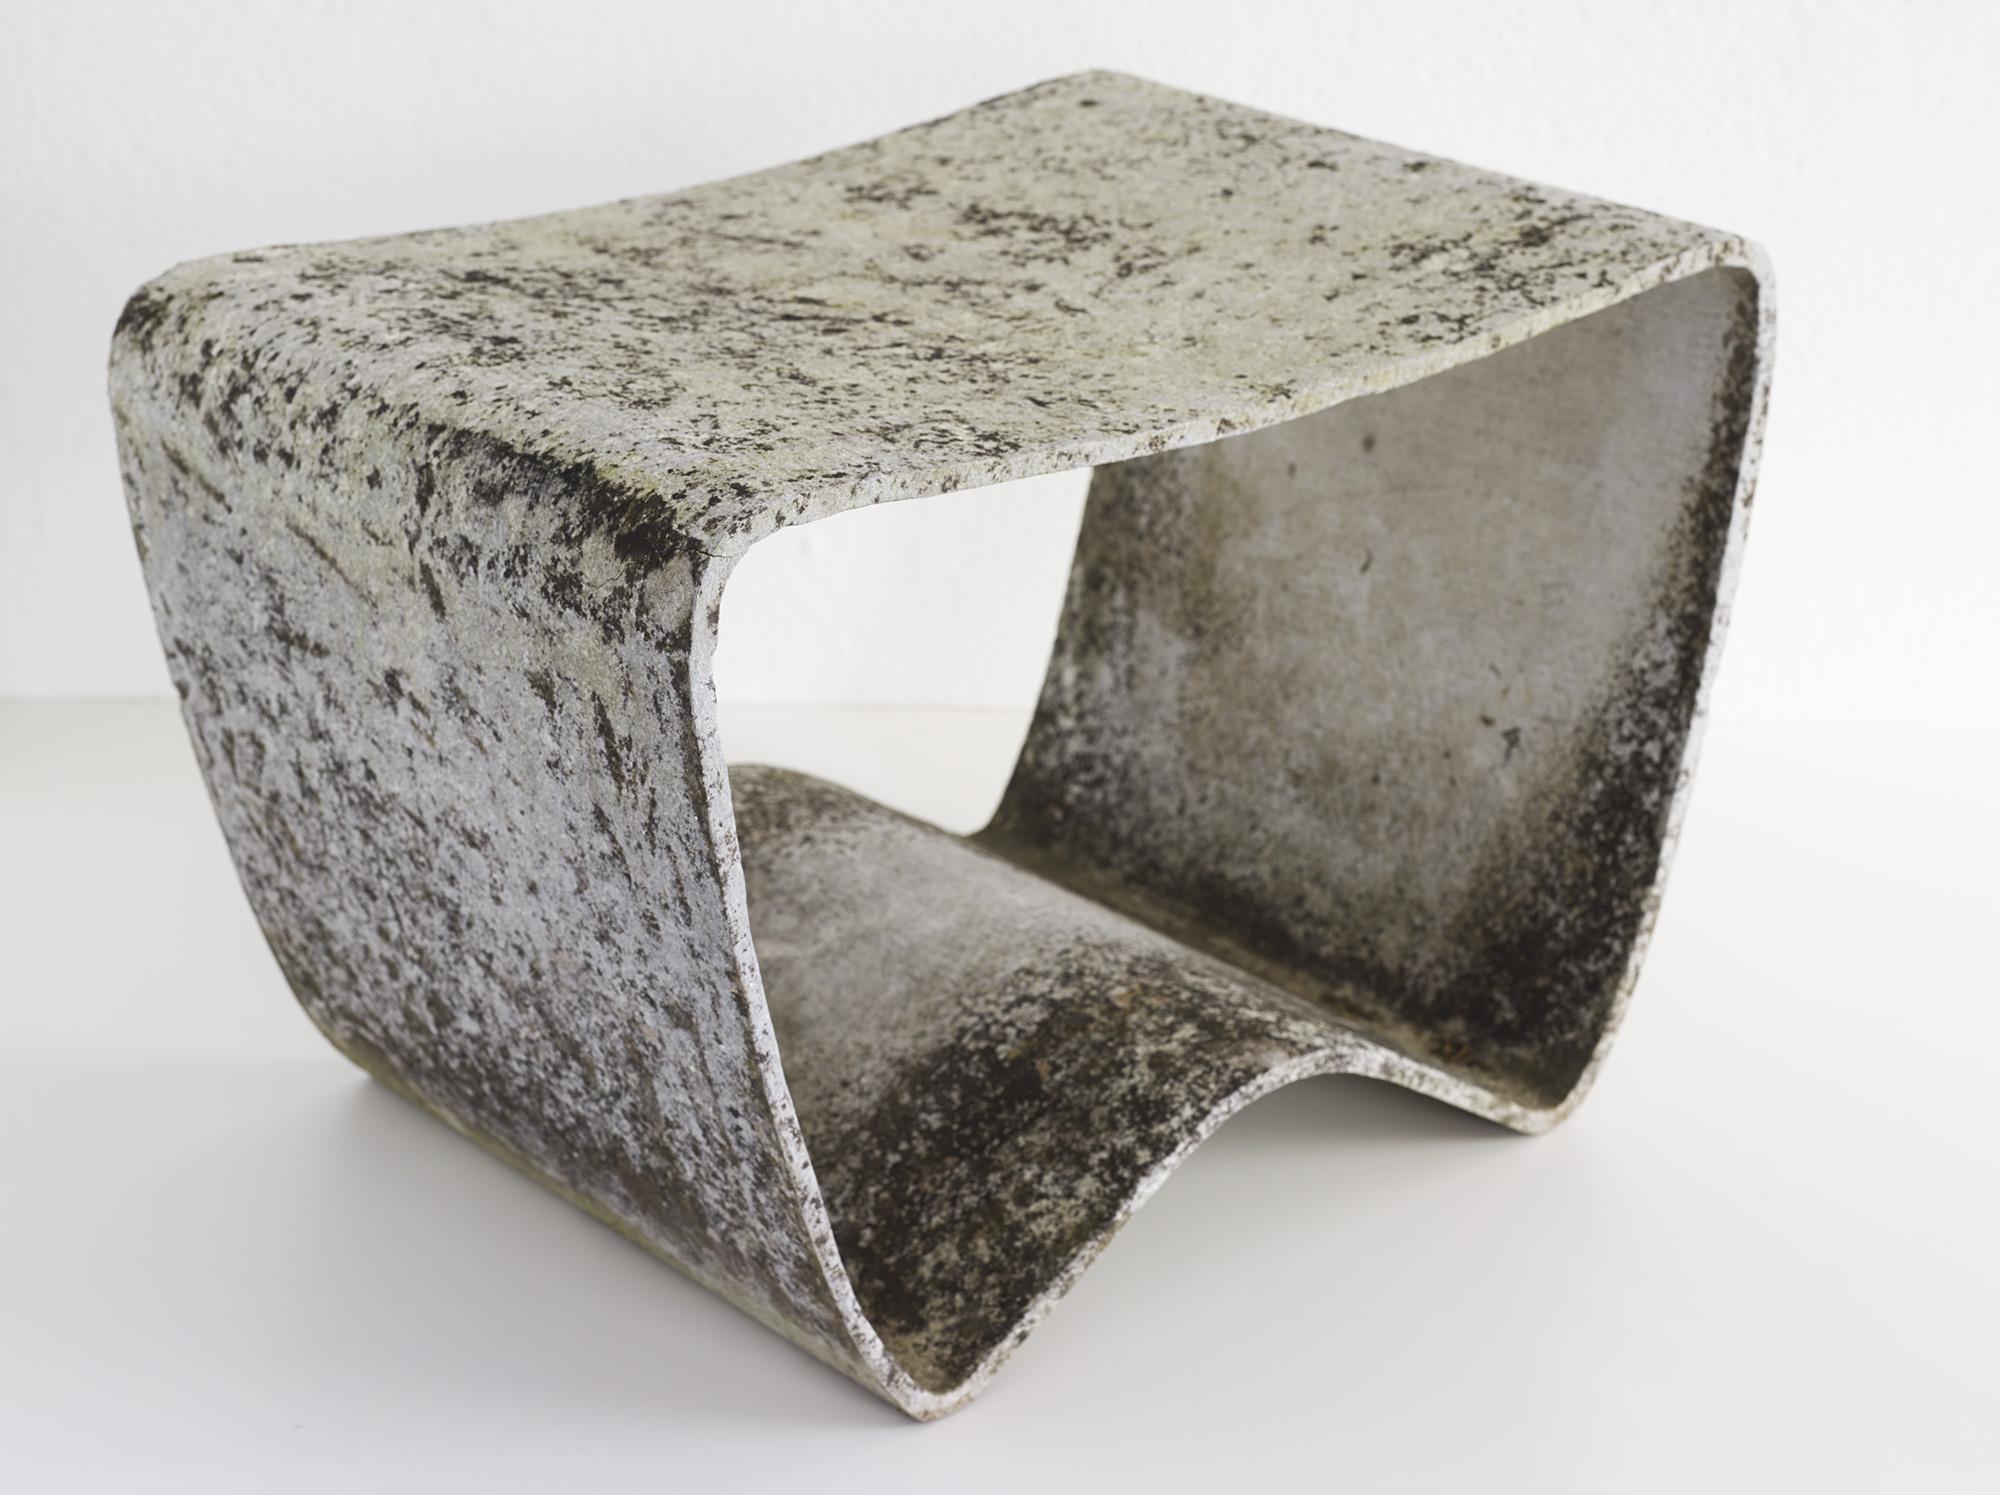 rare-stool-g59-11-by-ludwig-walser-image-01